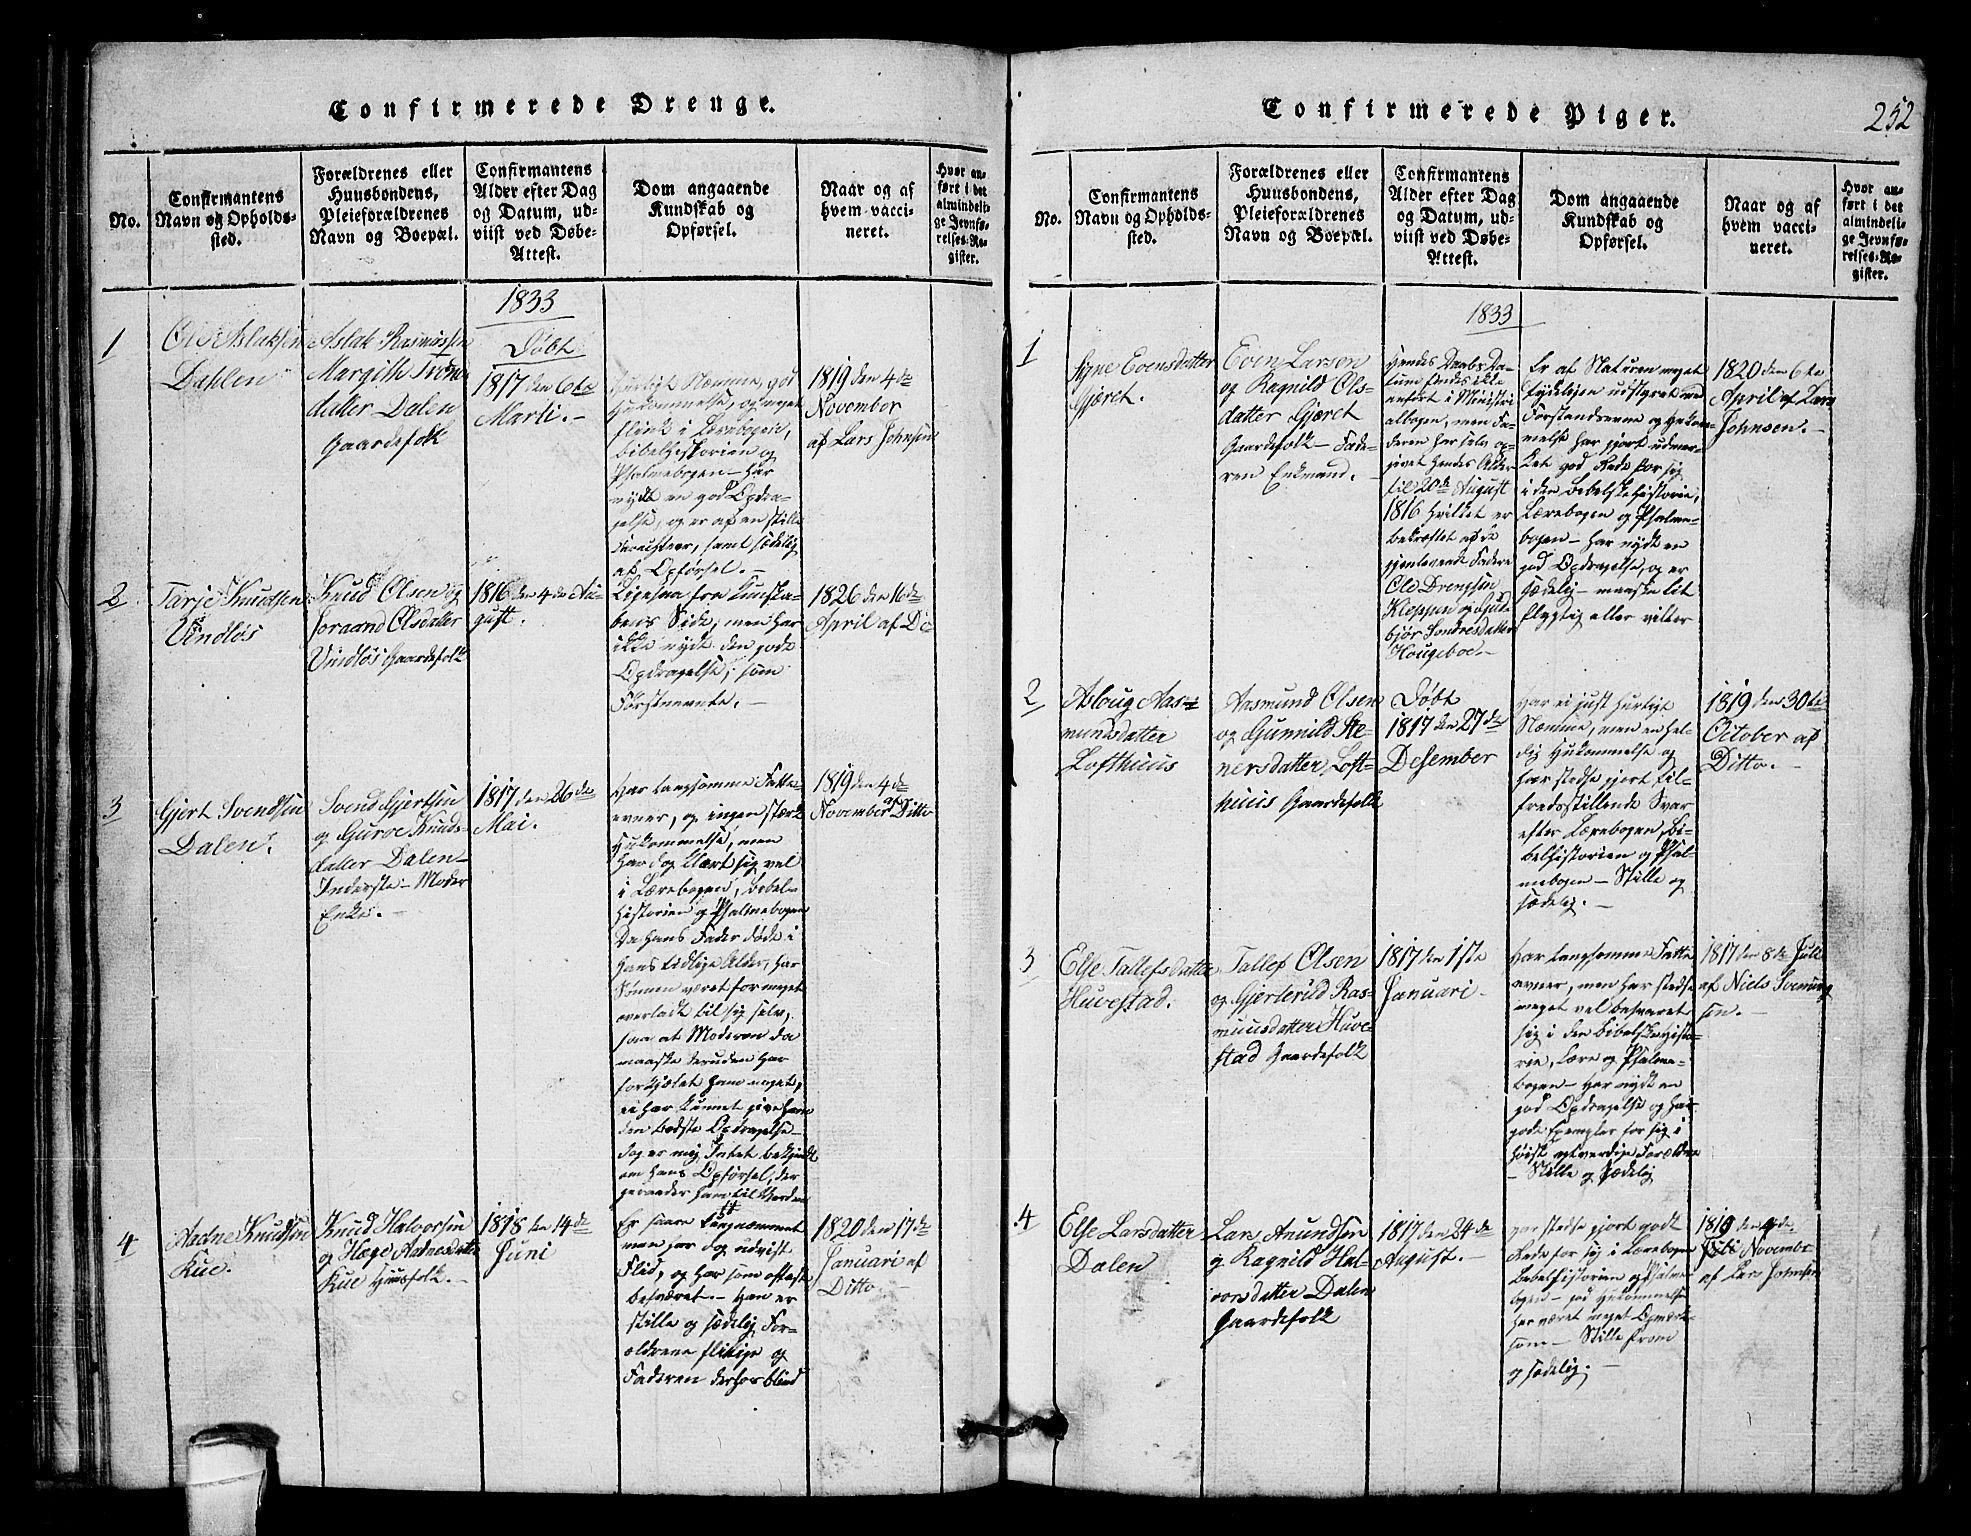 SAKO, Lårdal kirkebøker, G/Gb/L0001: Klokkerbok nr. II 1, 1815-1865, s. 252